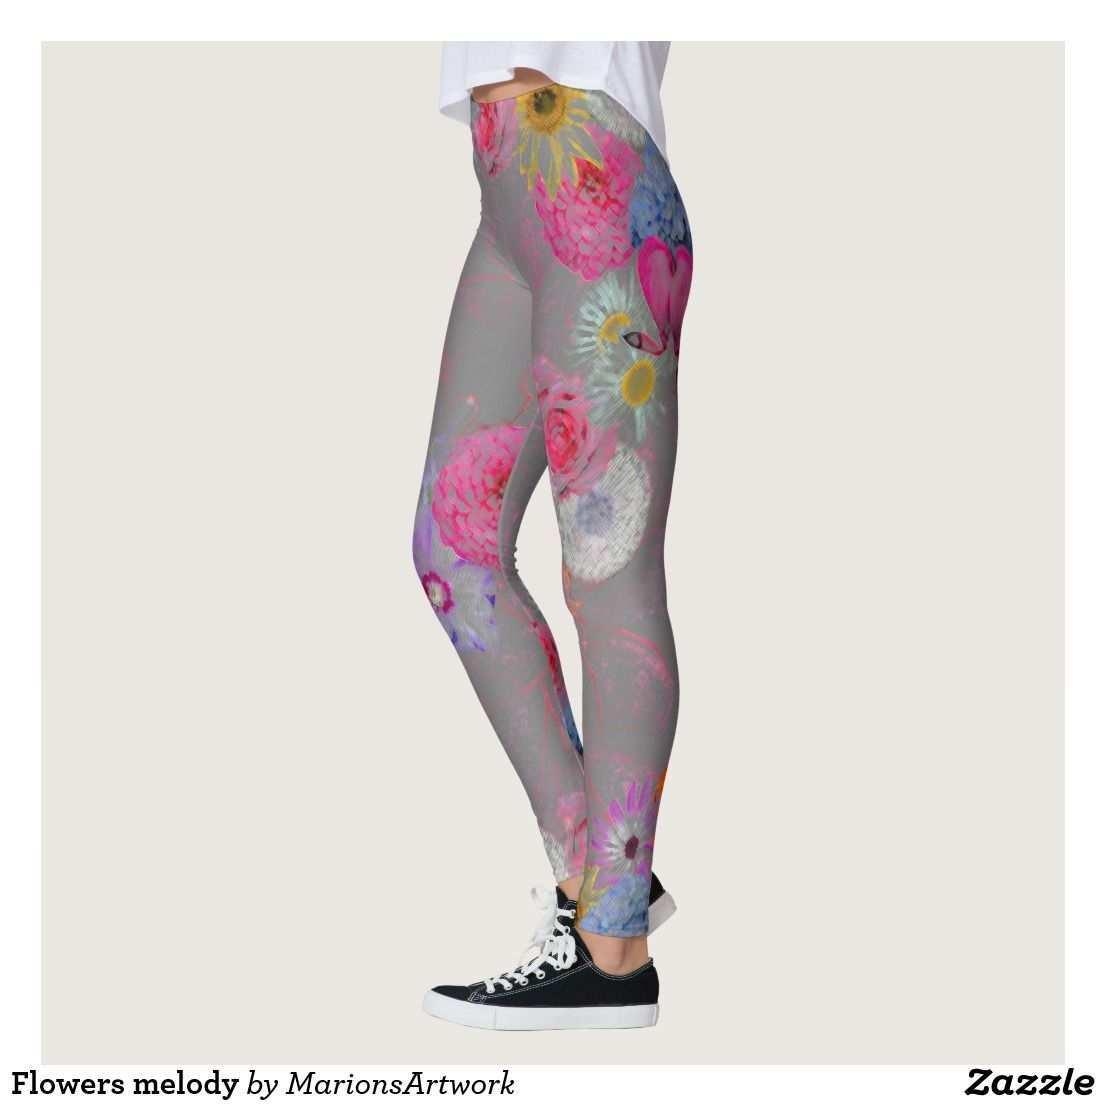 Flowers Melody Leggings Zazzle De Beste Leggings Bunte Leggings Kleidung Accessoires